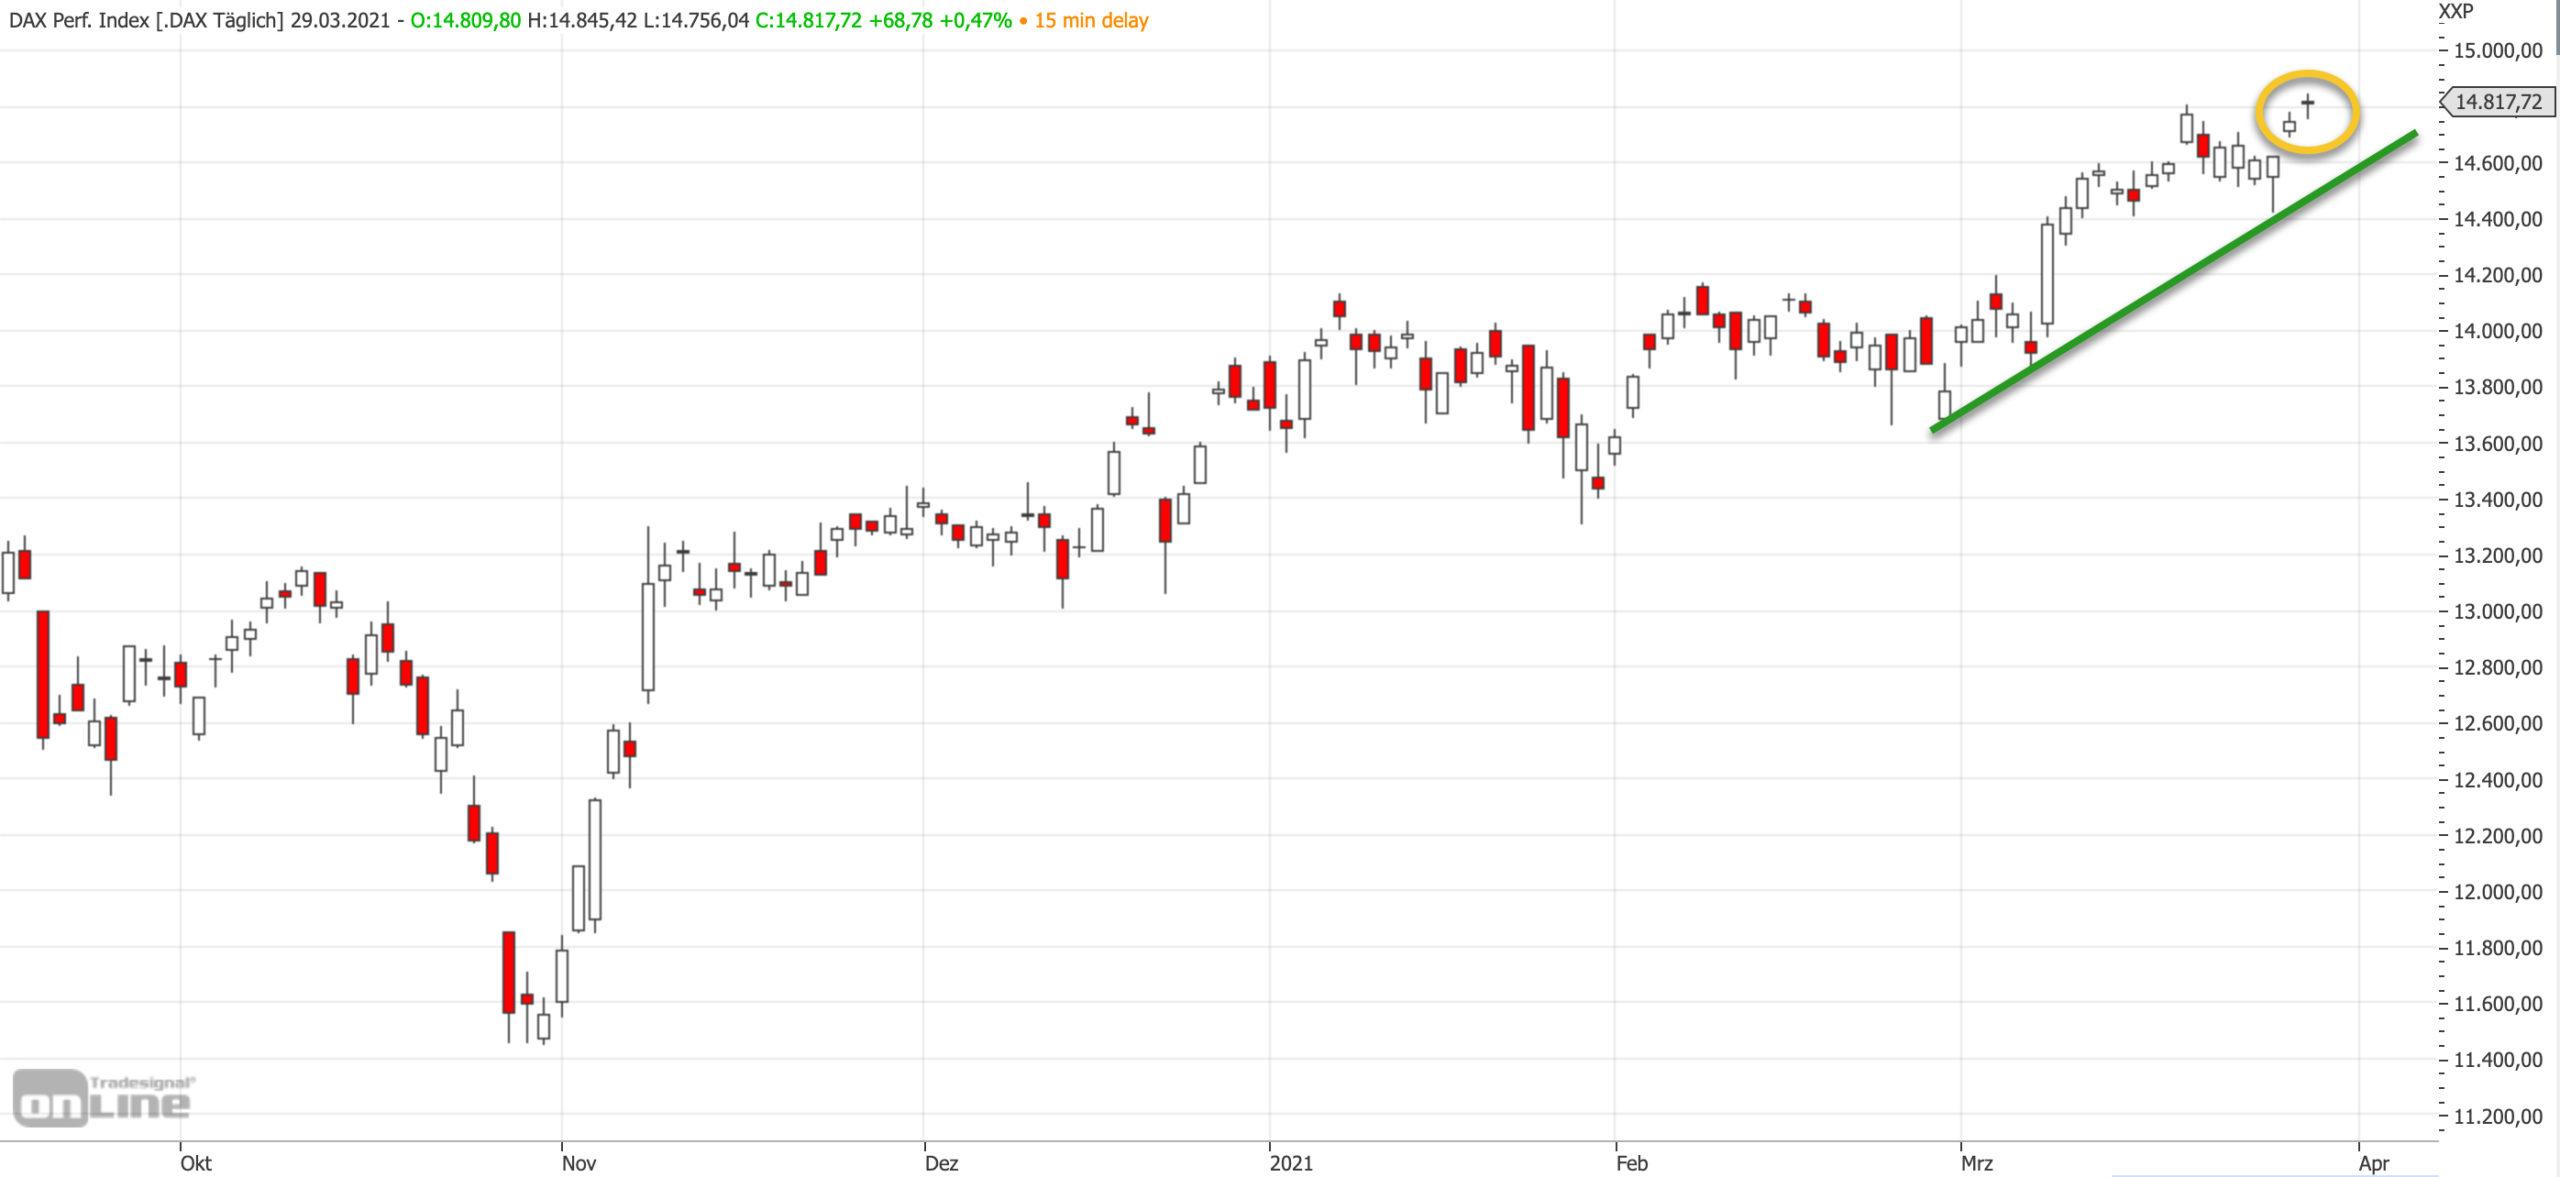 Mittelfristiger DAX-Chart am 29.03.2021